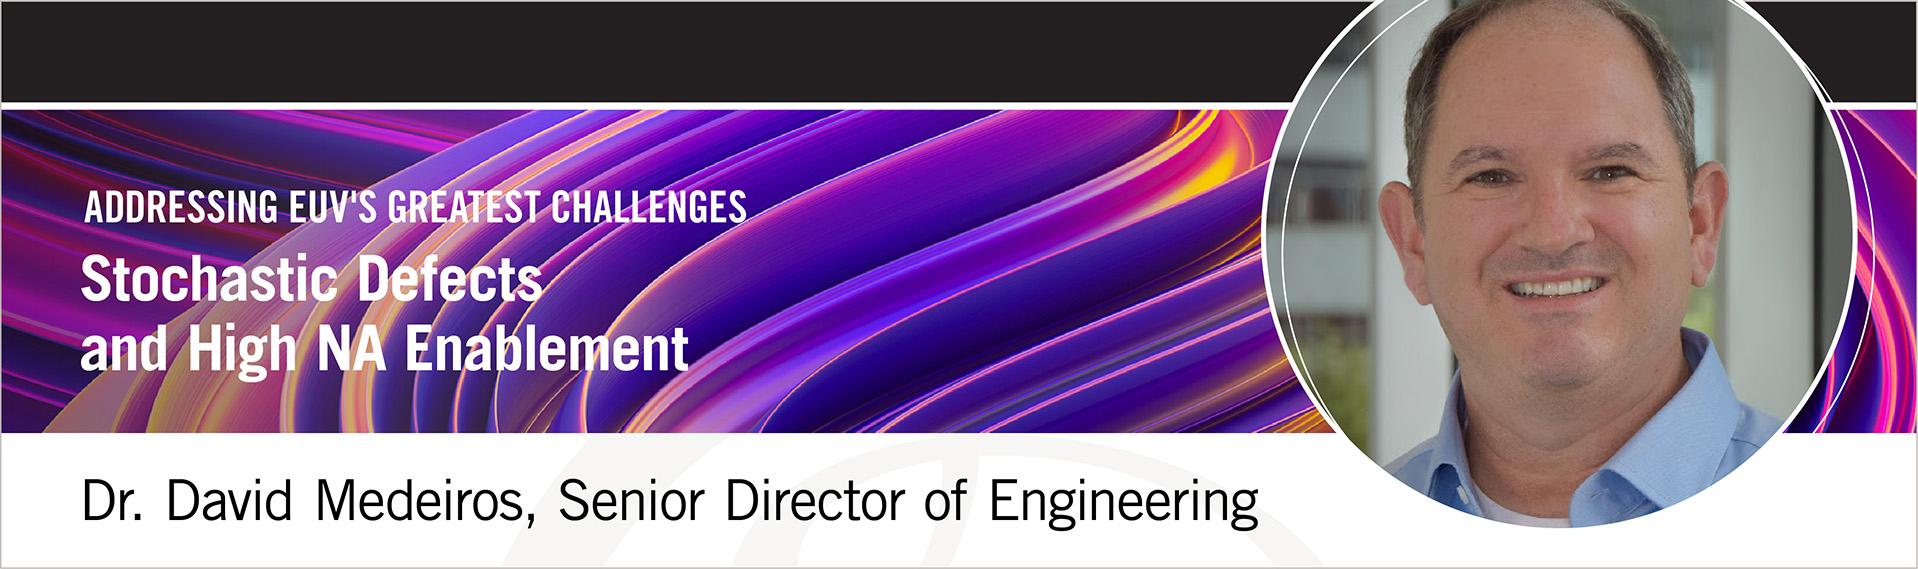 addressing-euvs-greatest-challenges-webinar-hubspot-11847-desktop-1918x568